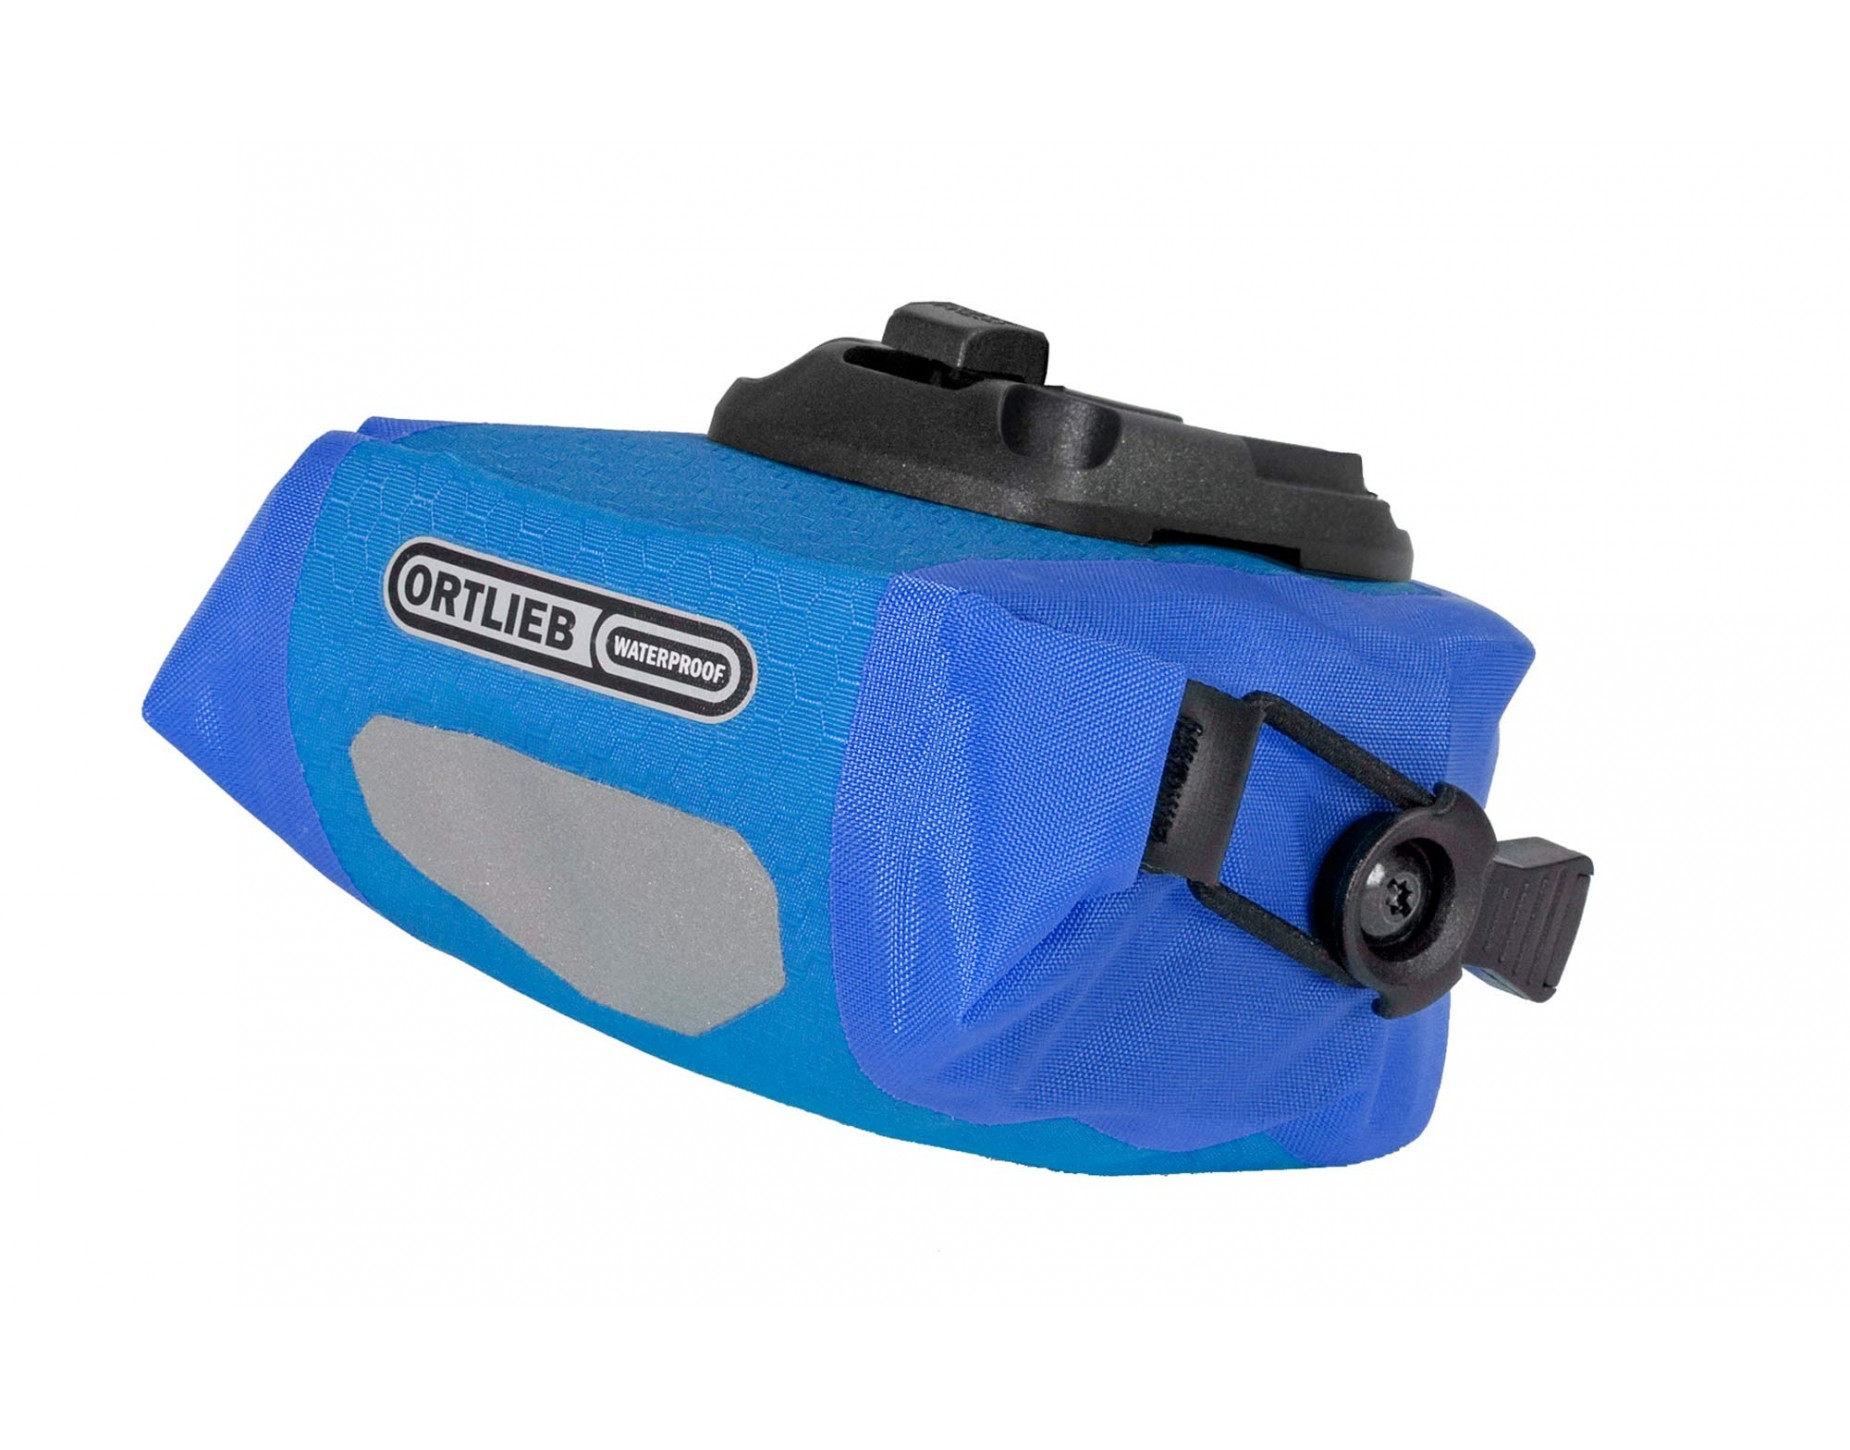 Ortlieb Micro blau